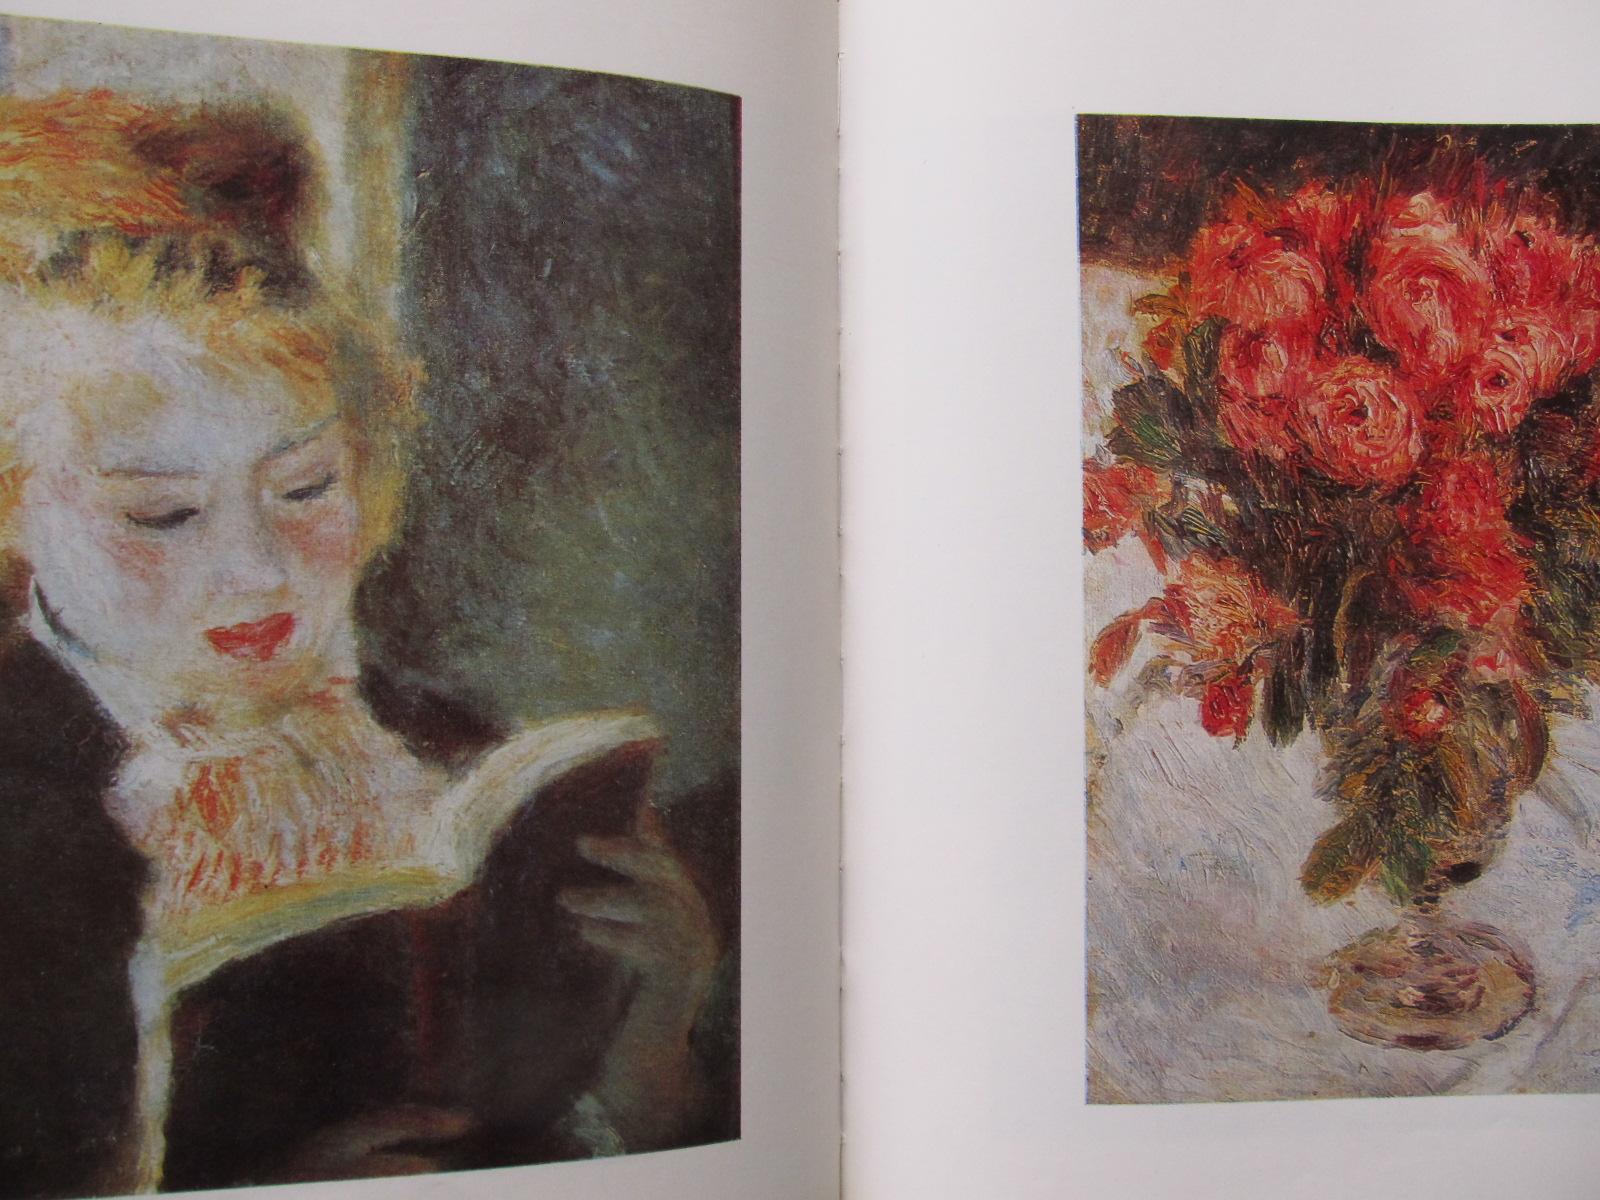 Carte Renoir (Album) - format foarte mare - Constantin Chirculescu